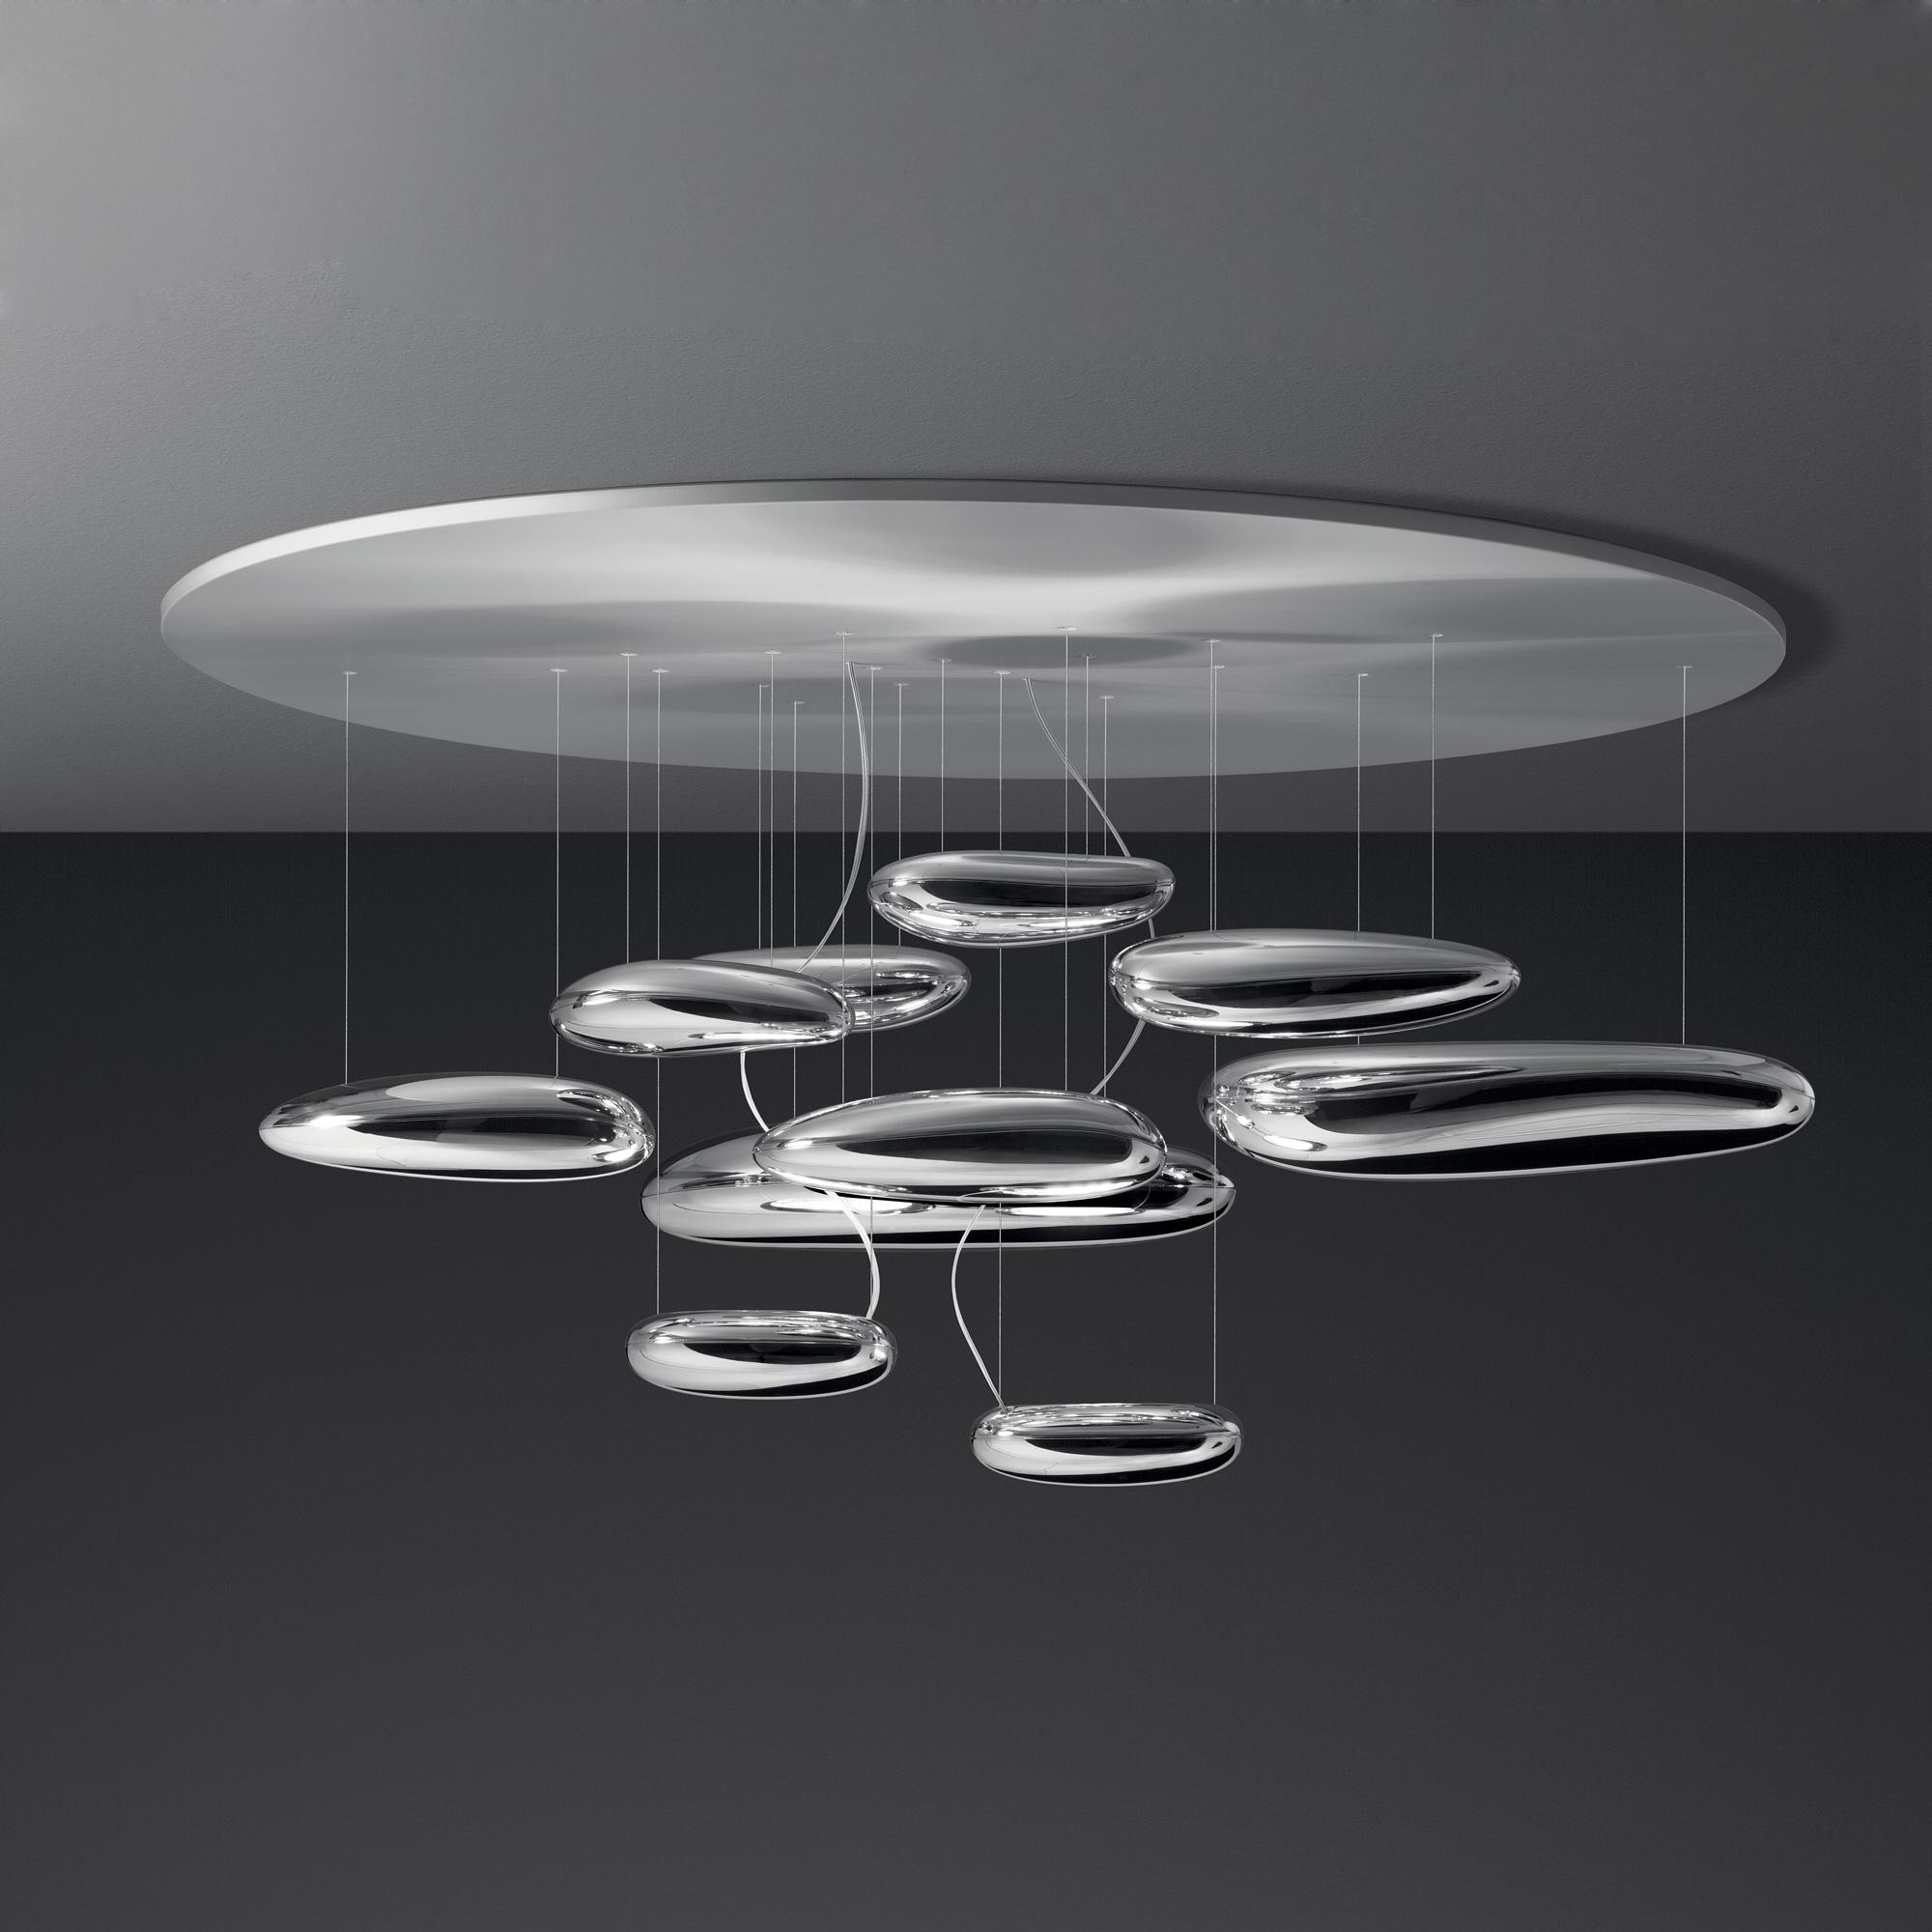 black ceiling lights modern photo - 4